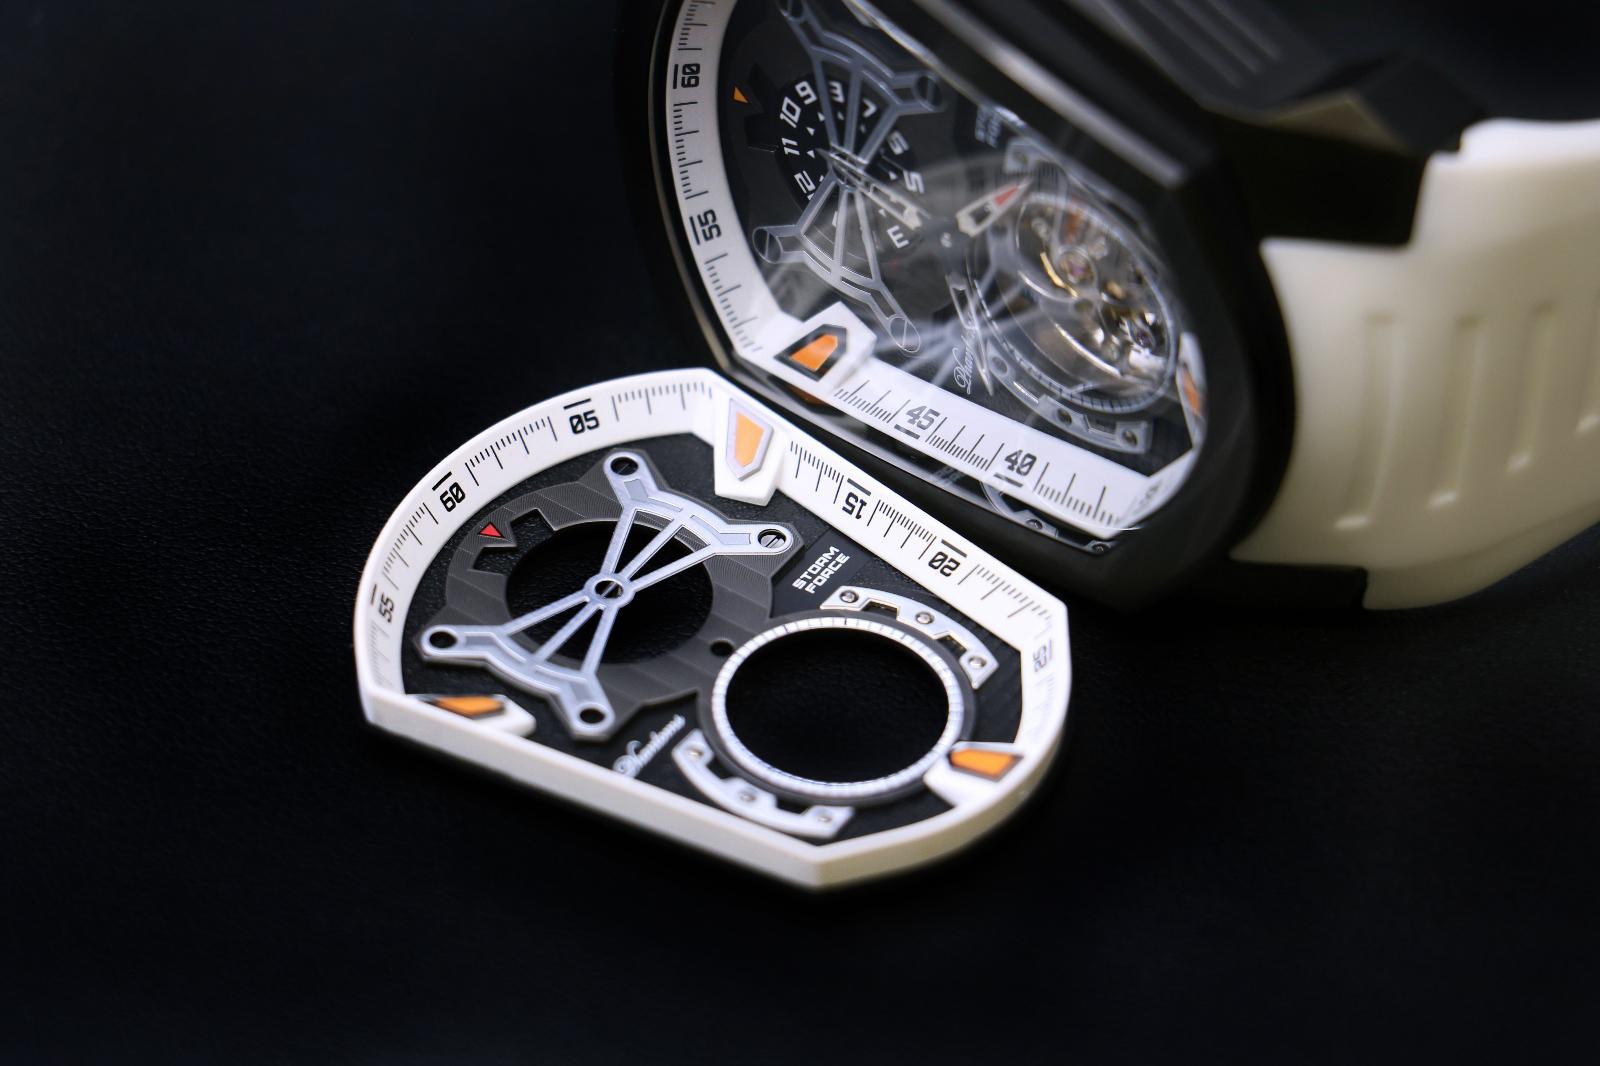 Phantoms Trinity Force Tourbillon Watch Series - 1325435